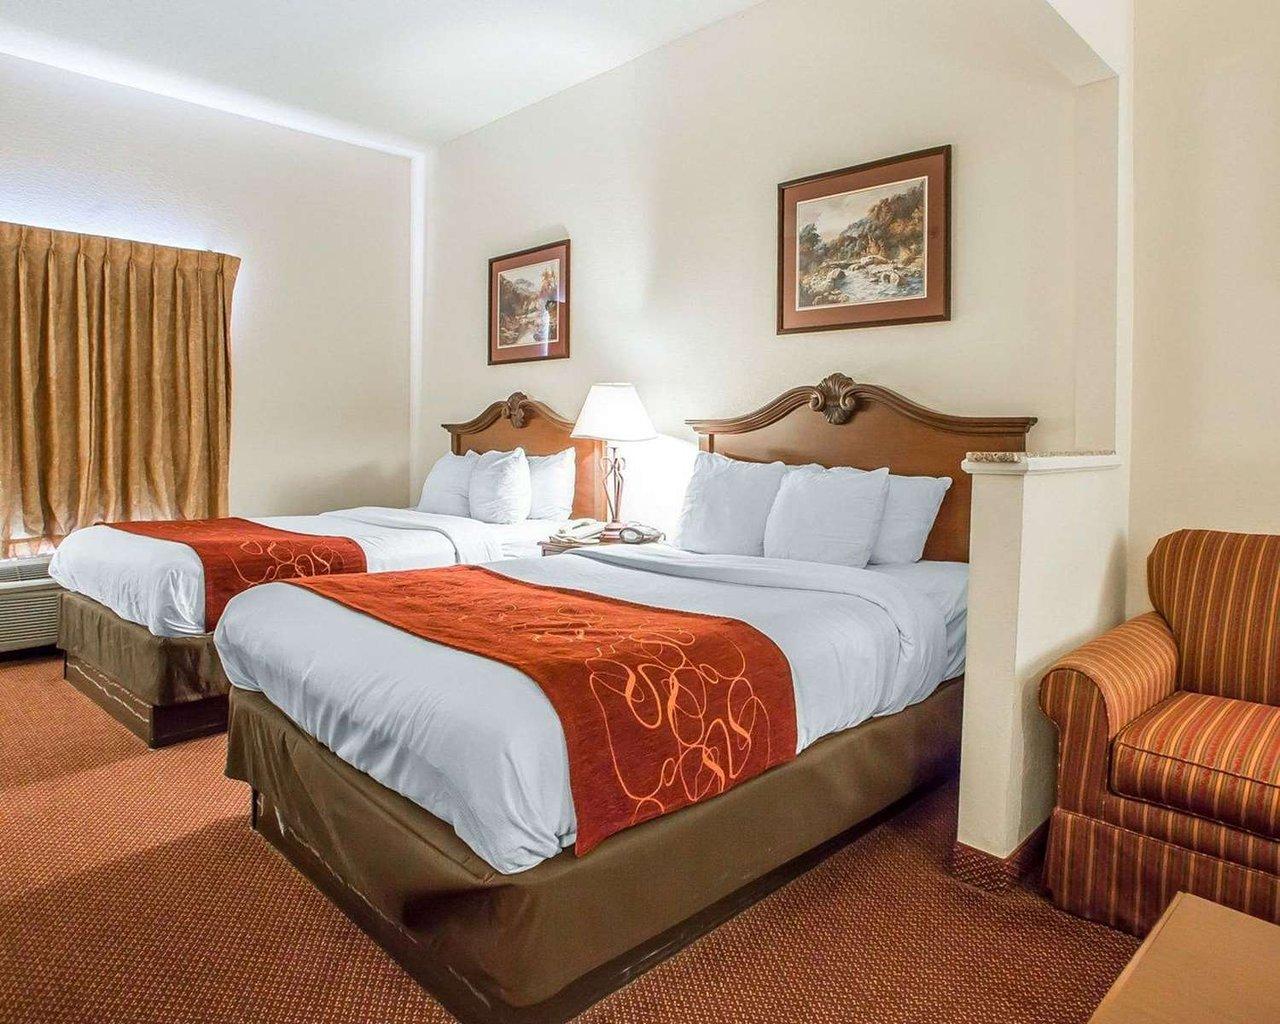 comfort suites jefferson city 94 1 1 4 updated 2019 prices rh tripadvisor com